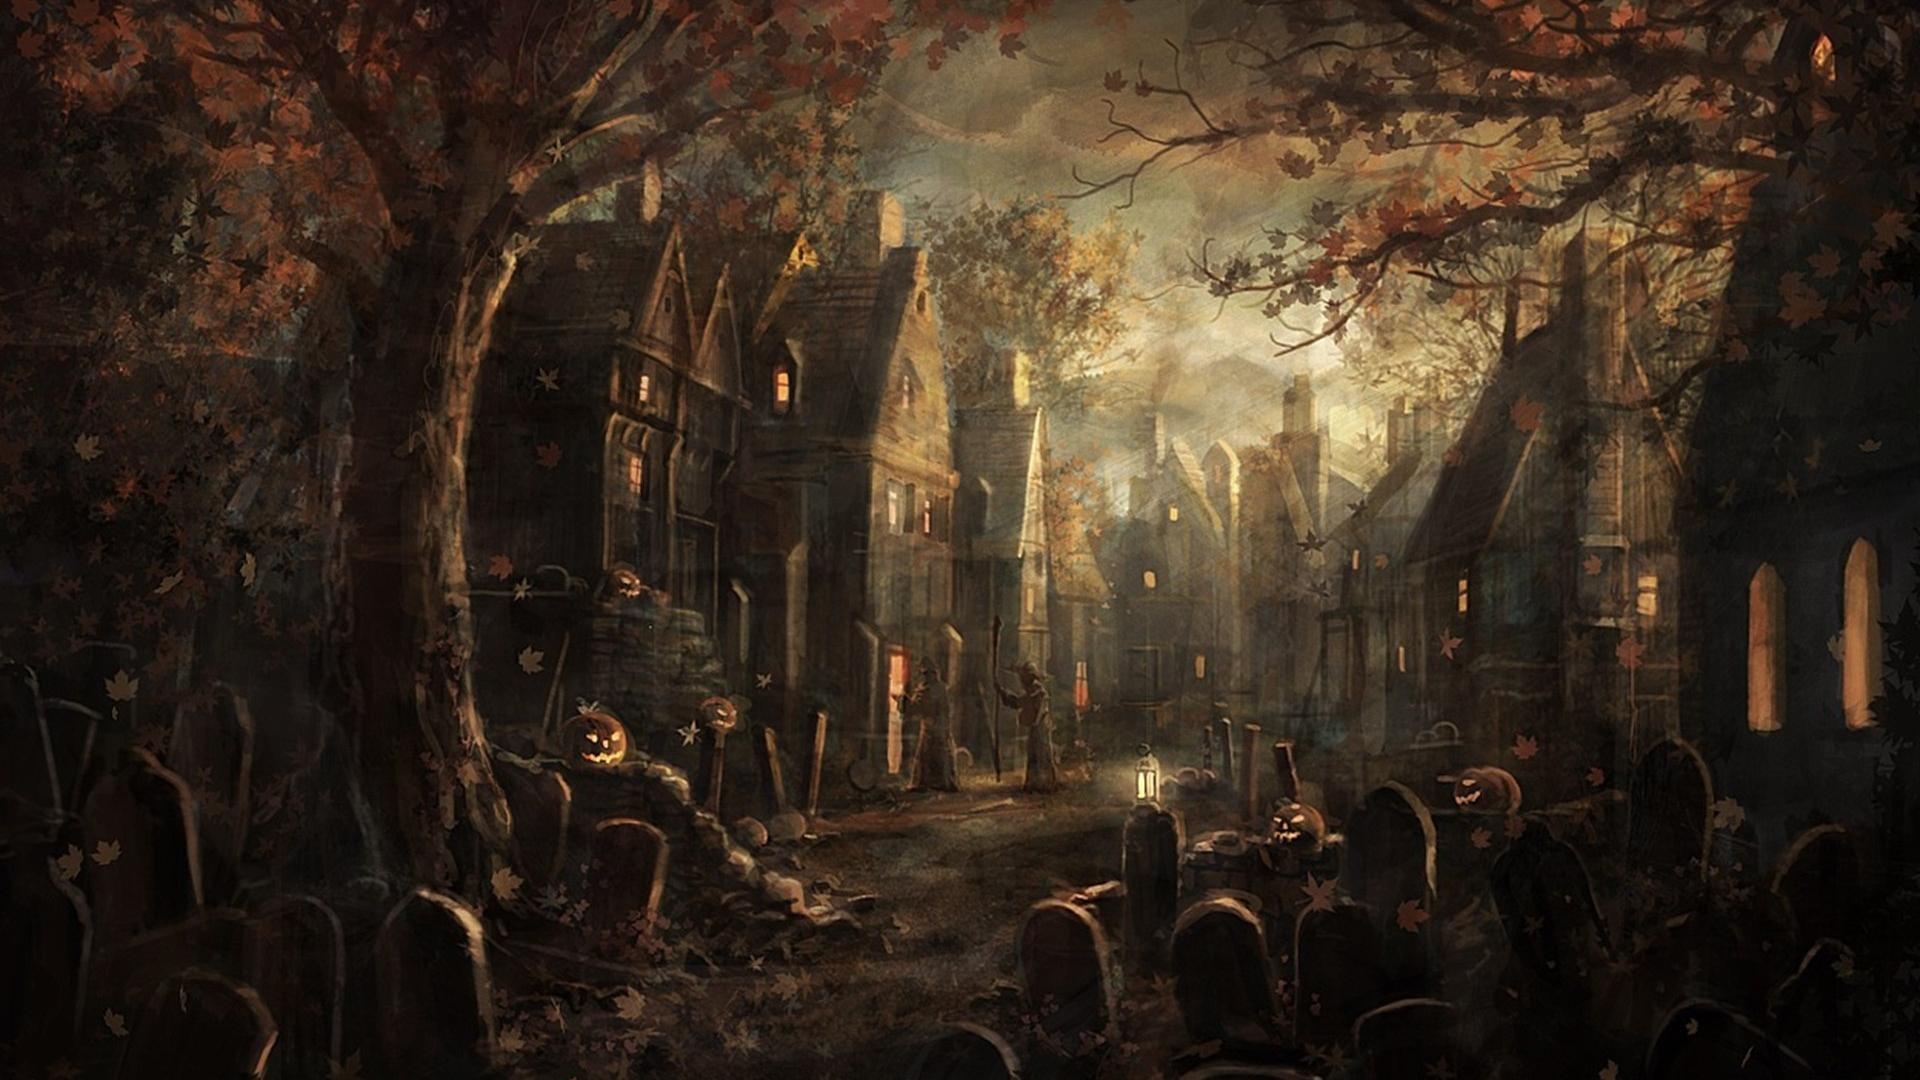 Res: 1920x1080, Halloween Wallpaper Hd